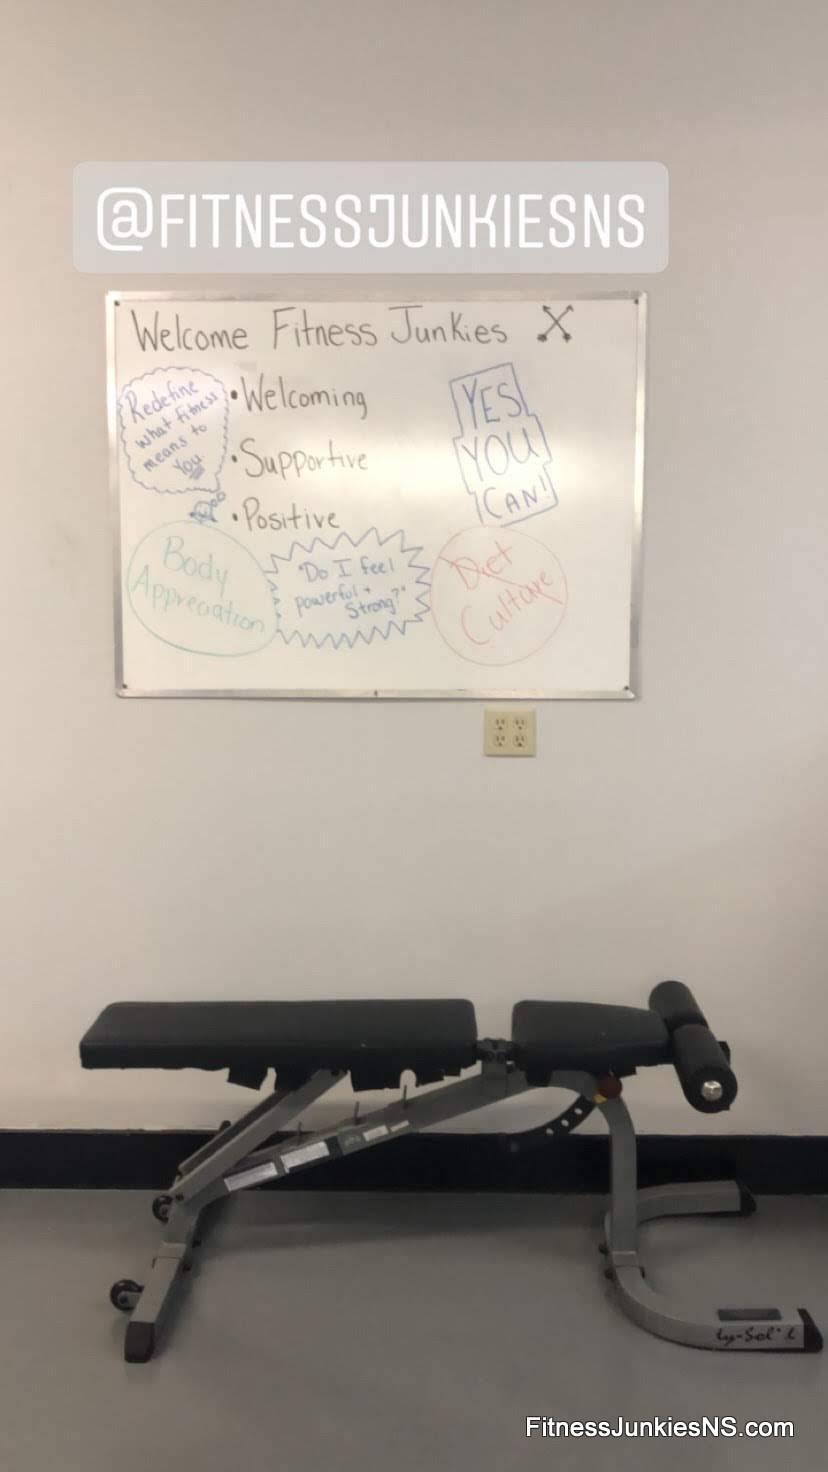 192-Fitness Junkies Windsor NS 9-24-2019 4-39-057.jpg